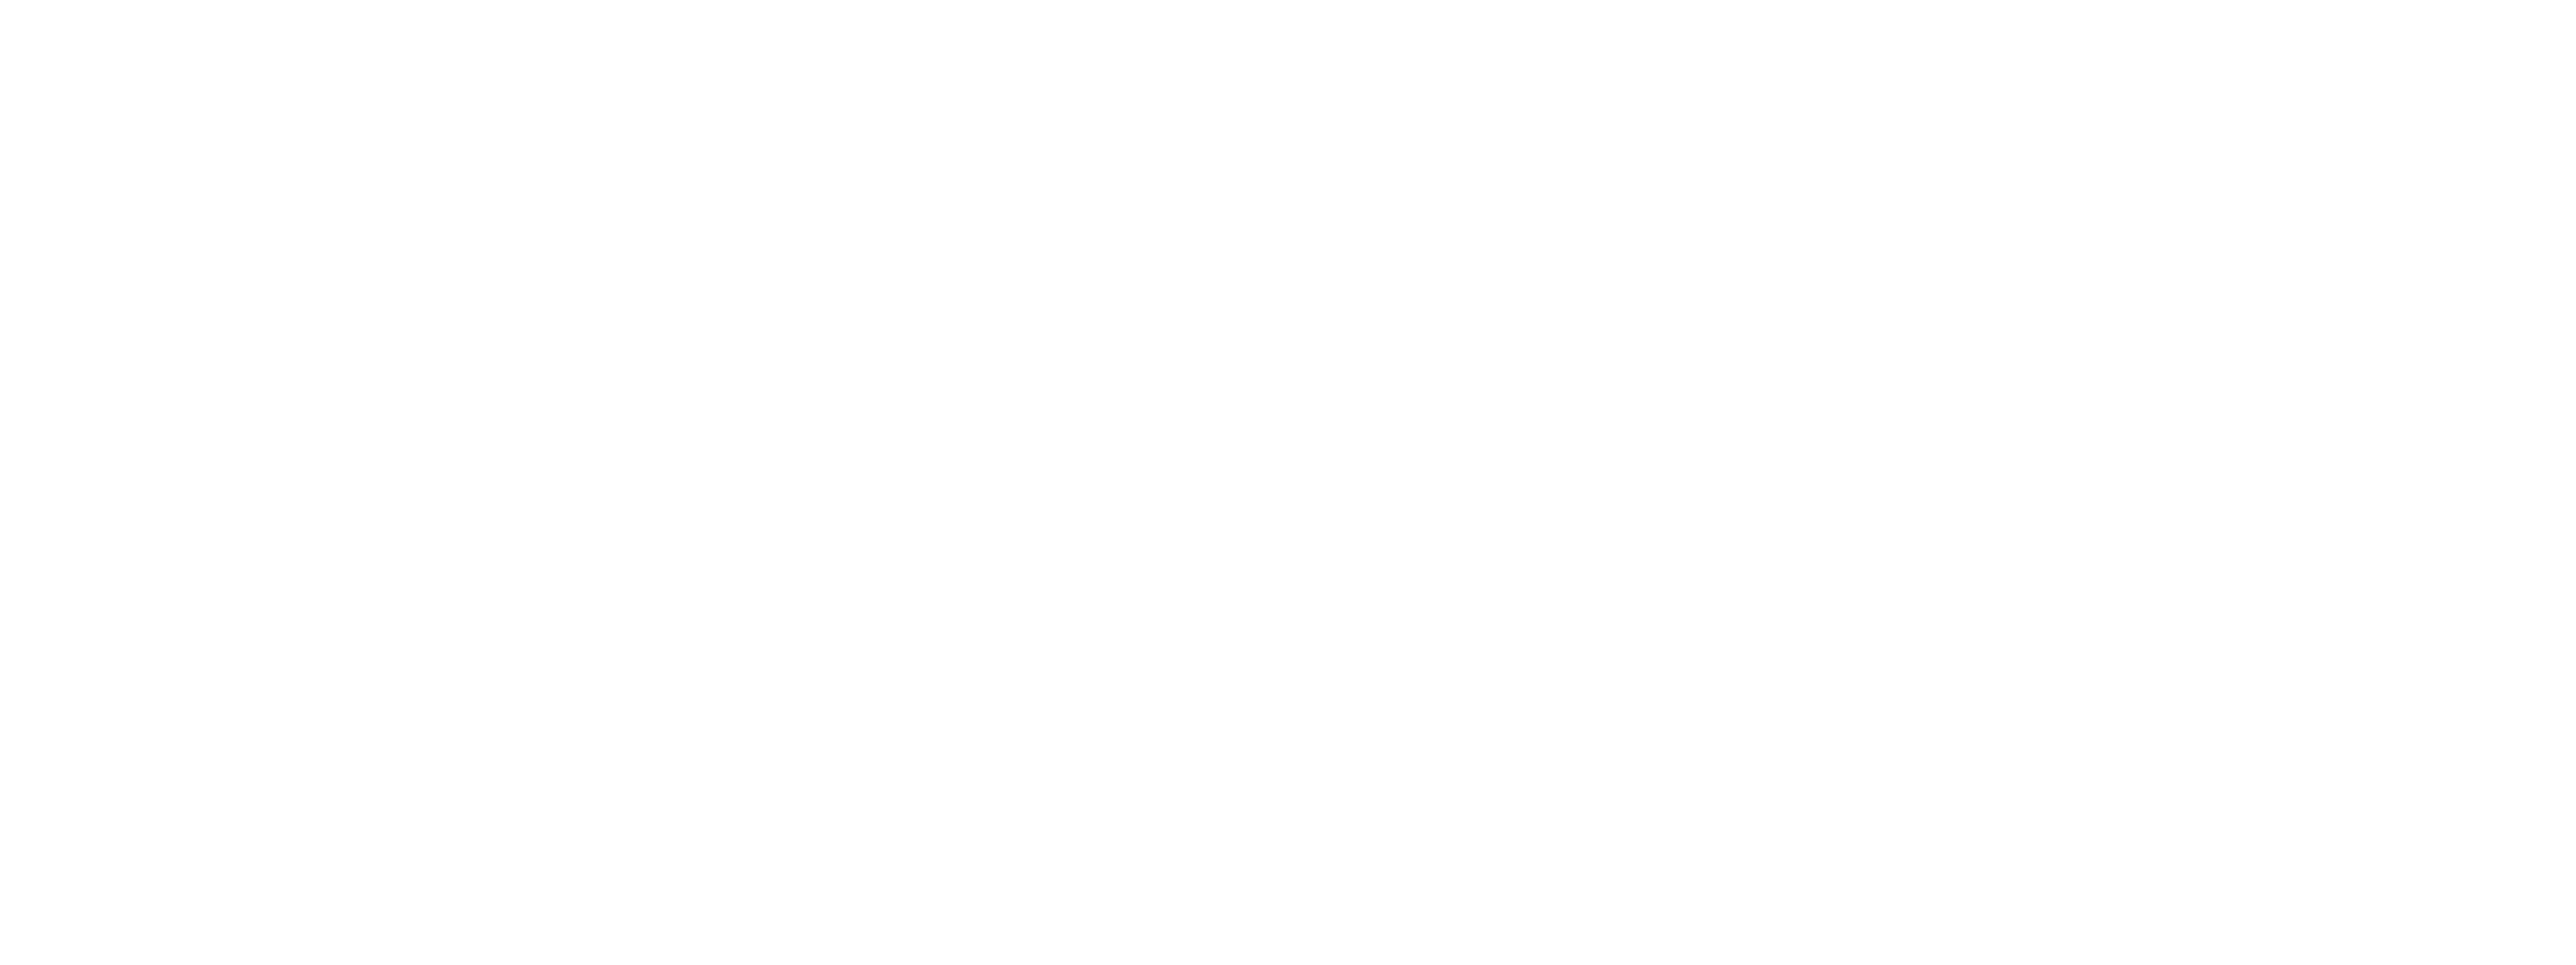 Flyer Films